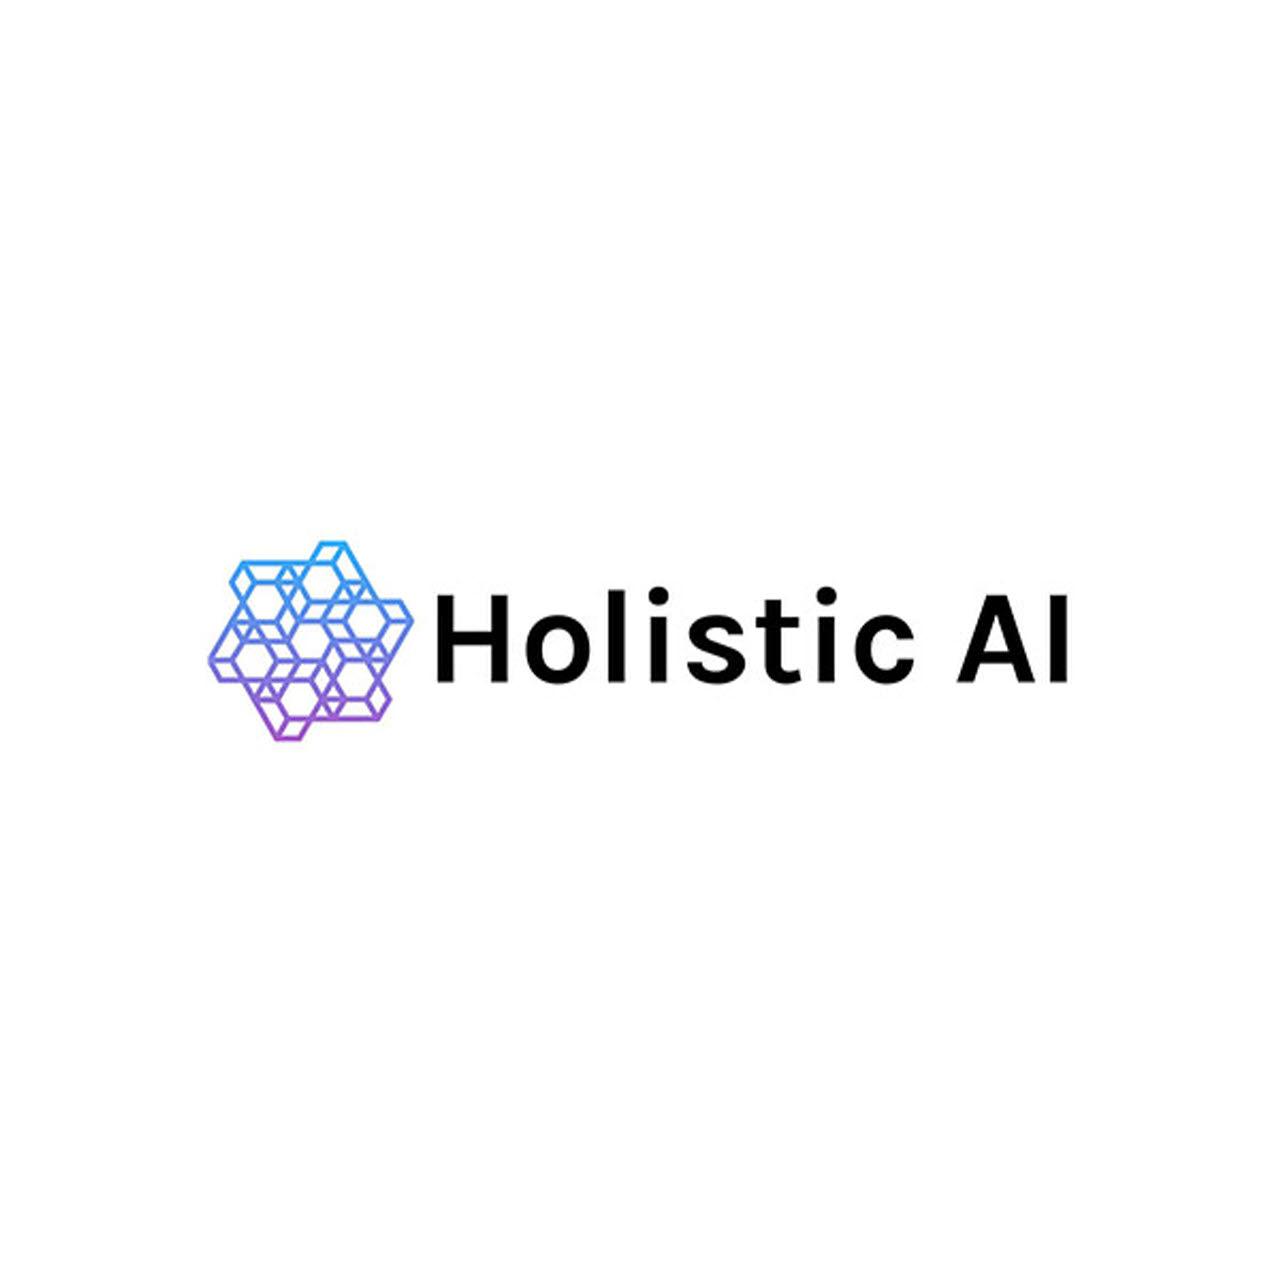 Holistic AI.jpg